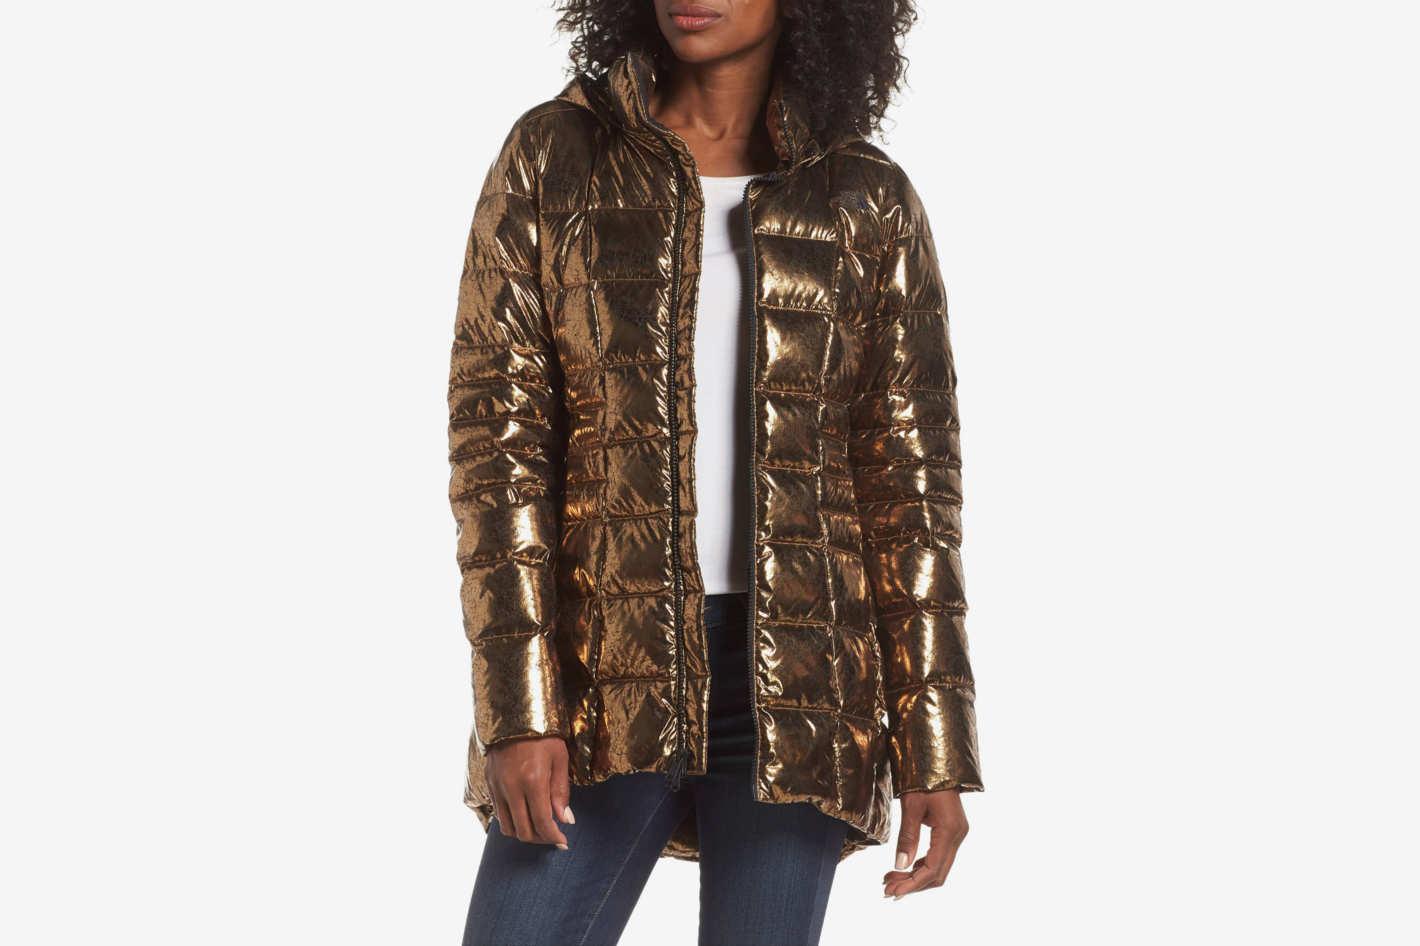 e87f47033b The 14 Best Cheap Warm Coats for Winter 2019